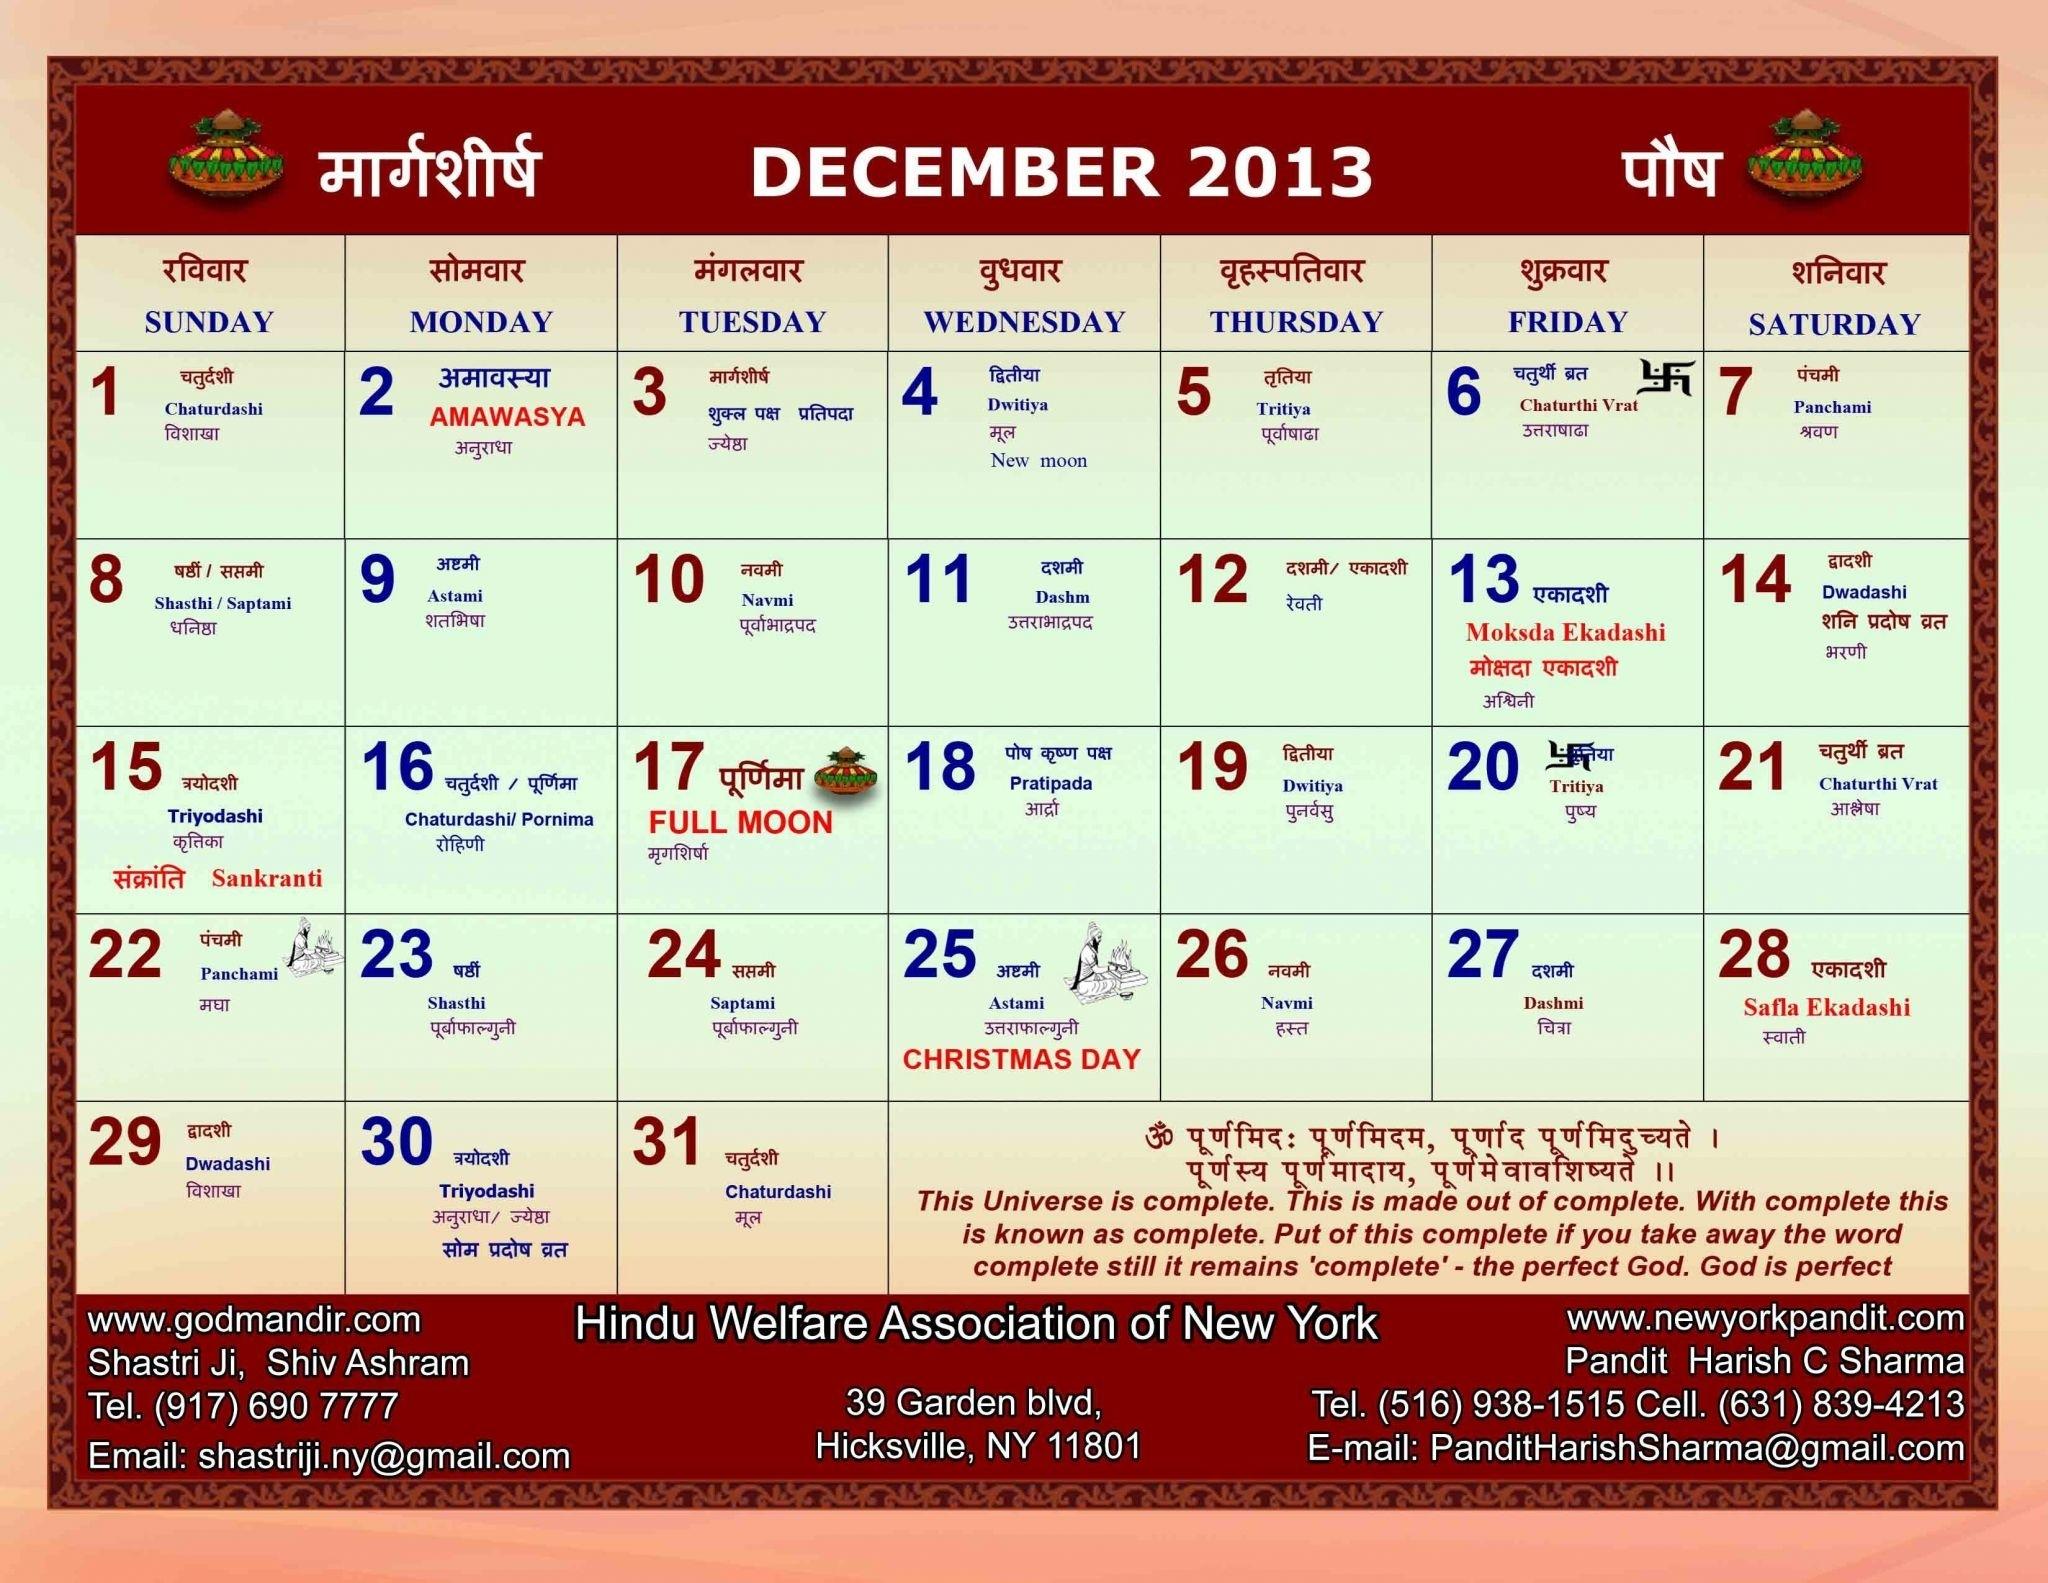 Calendar 2019 Hindi Lala Ramswaroop Pdf Free Download - Nail